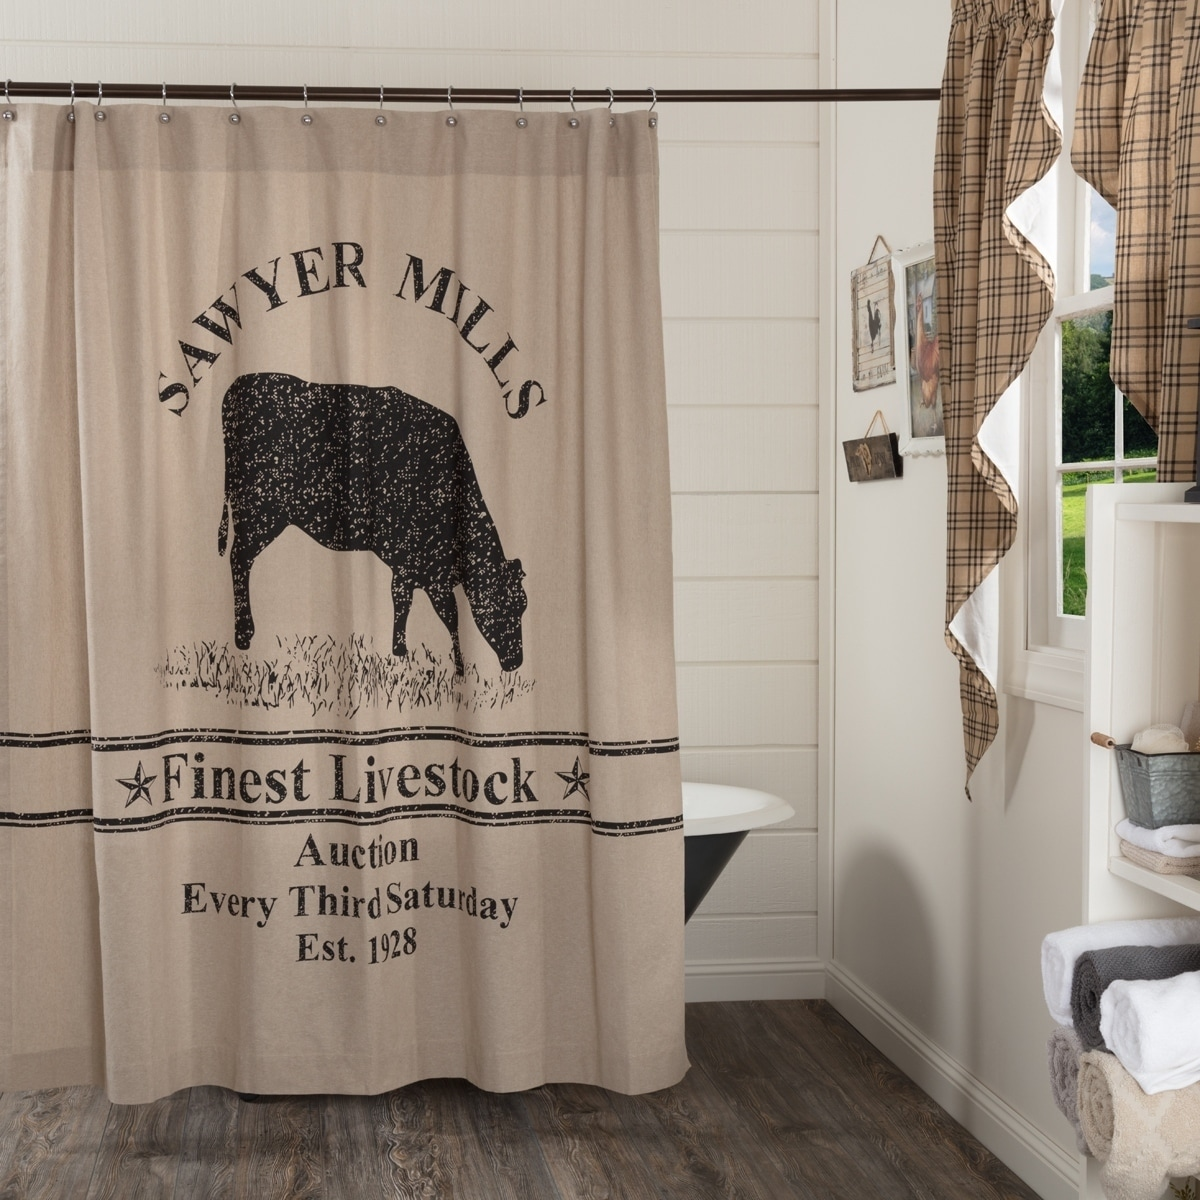 Tan Farmhouse Bath Vhc Sawyer Mill Cow Shower Curtain Rod Pocket Cotton Nature Print Stenciled Chambray